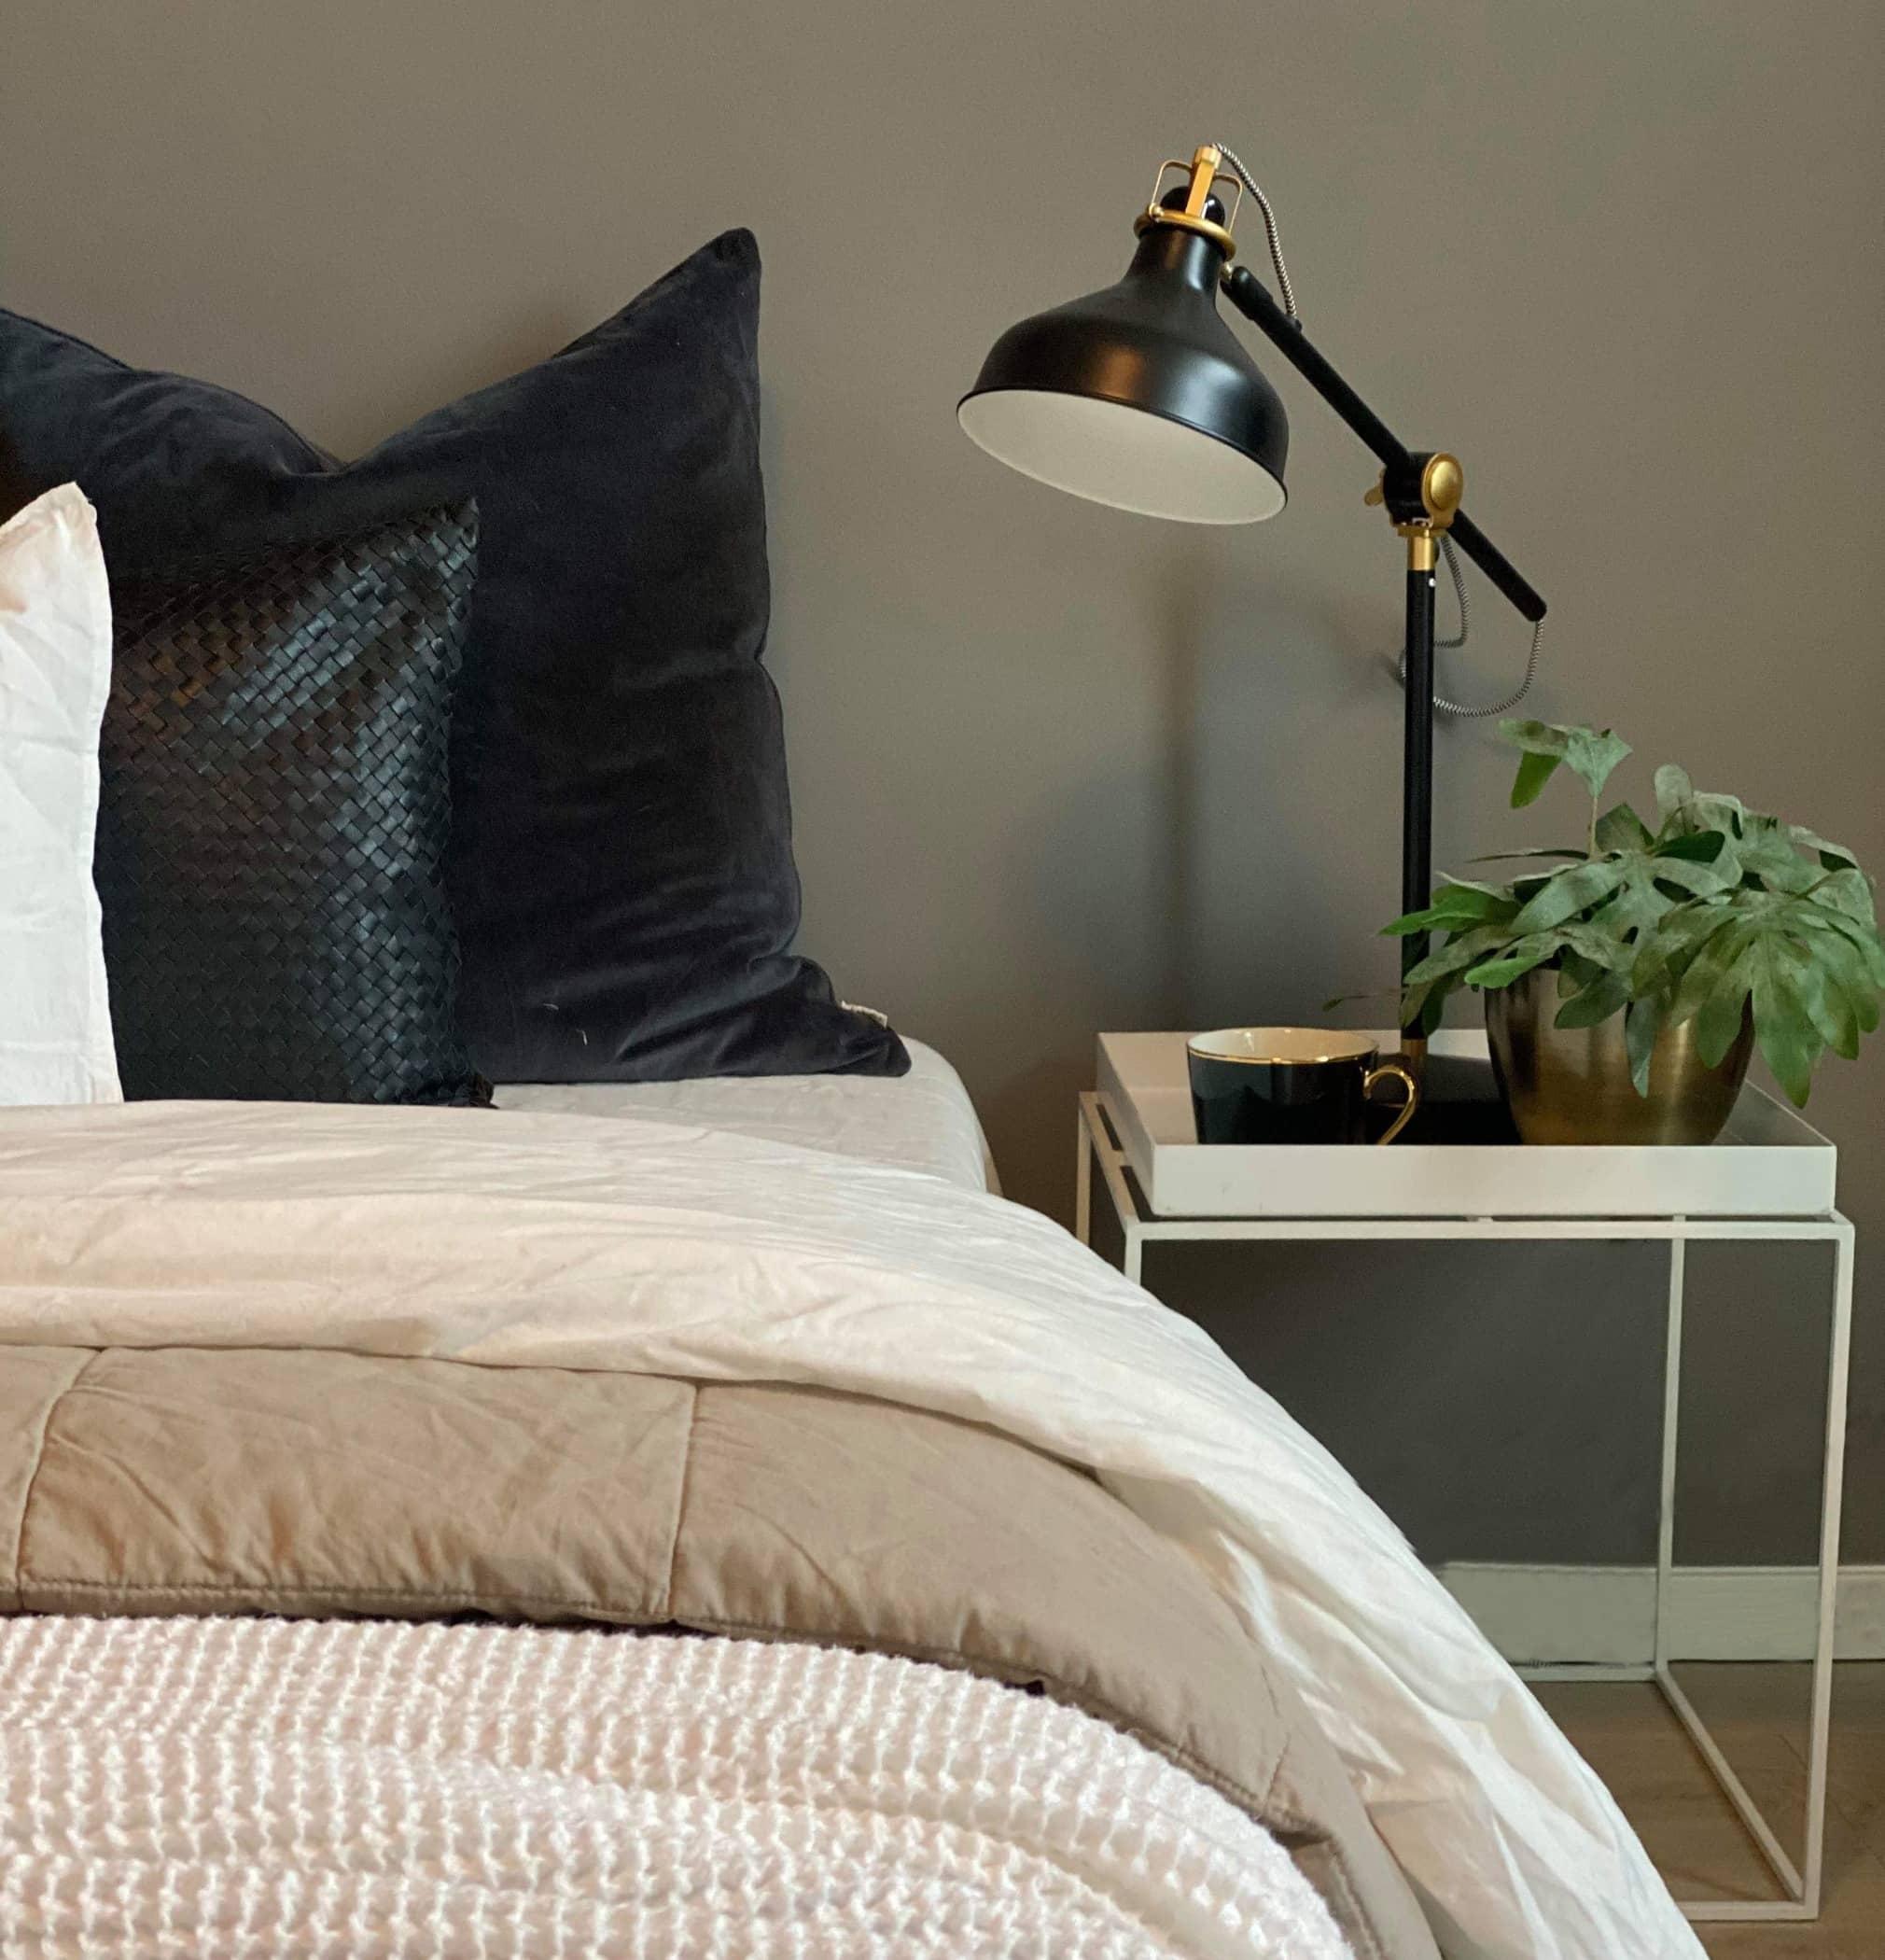 Bed sheet, Lighting, Cushion, Nightstand, Pillow, Room, Bedroom, Furniture, Bedding